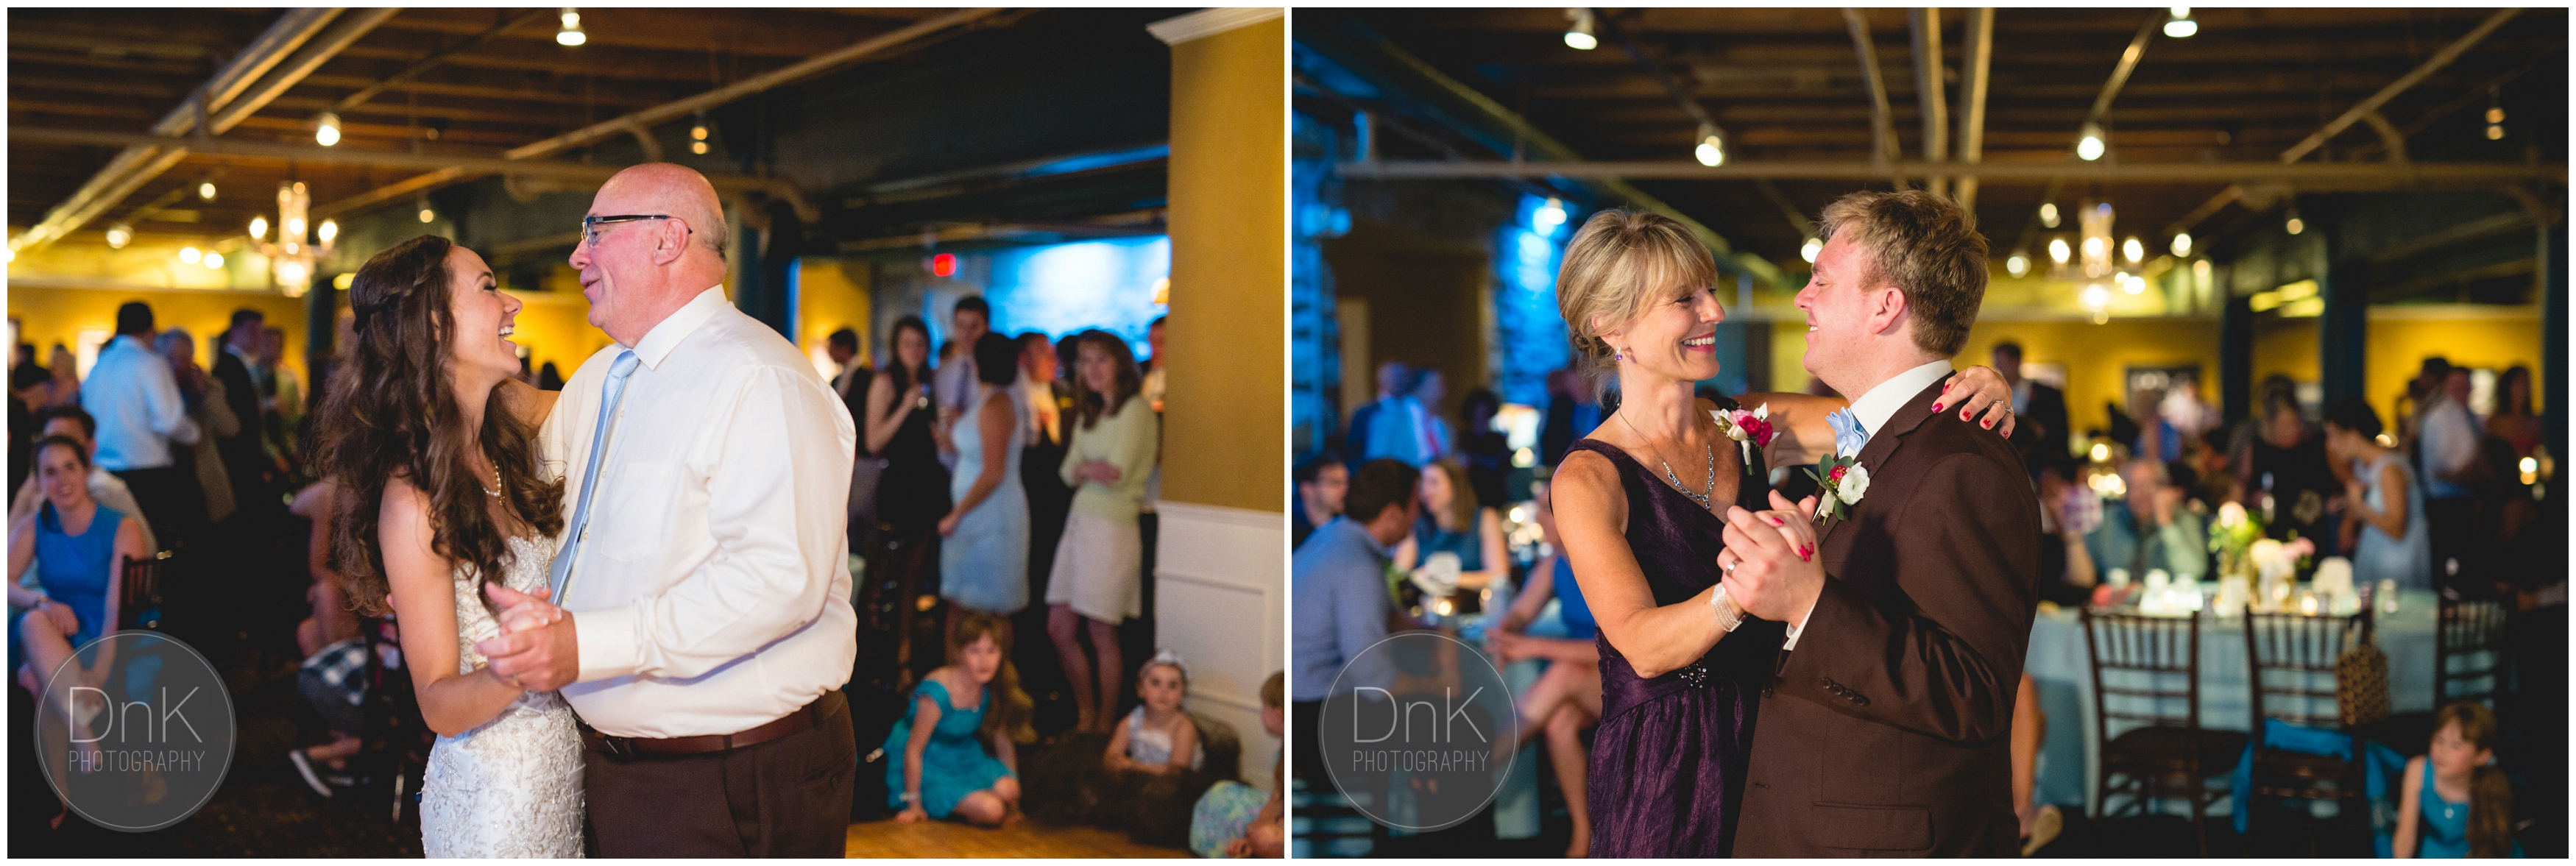 40 - 413 on Wacouta Wedding Reception Dance